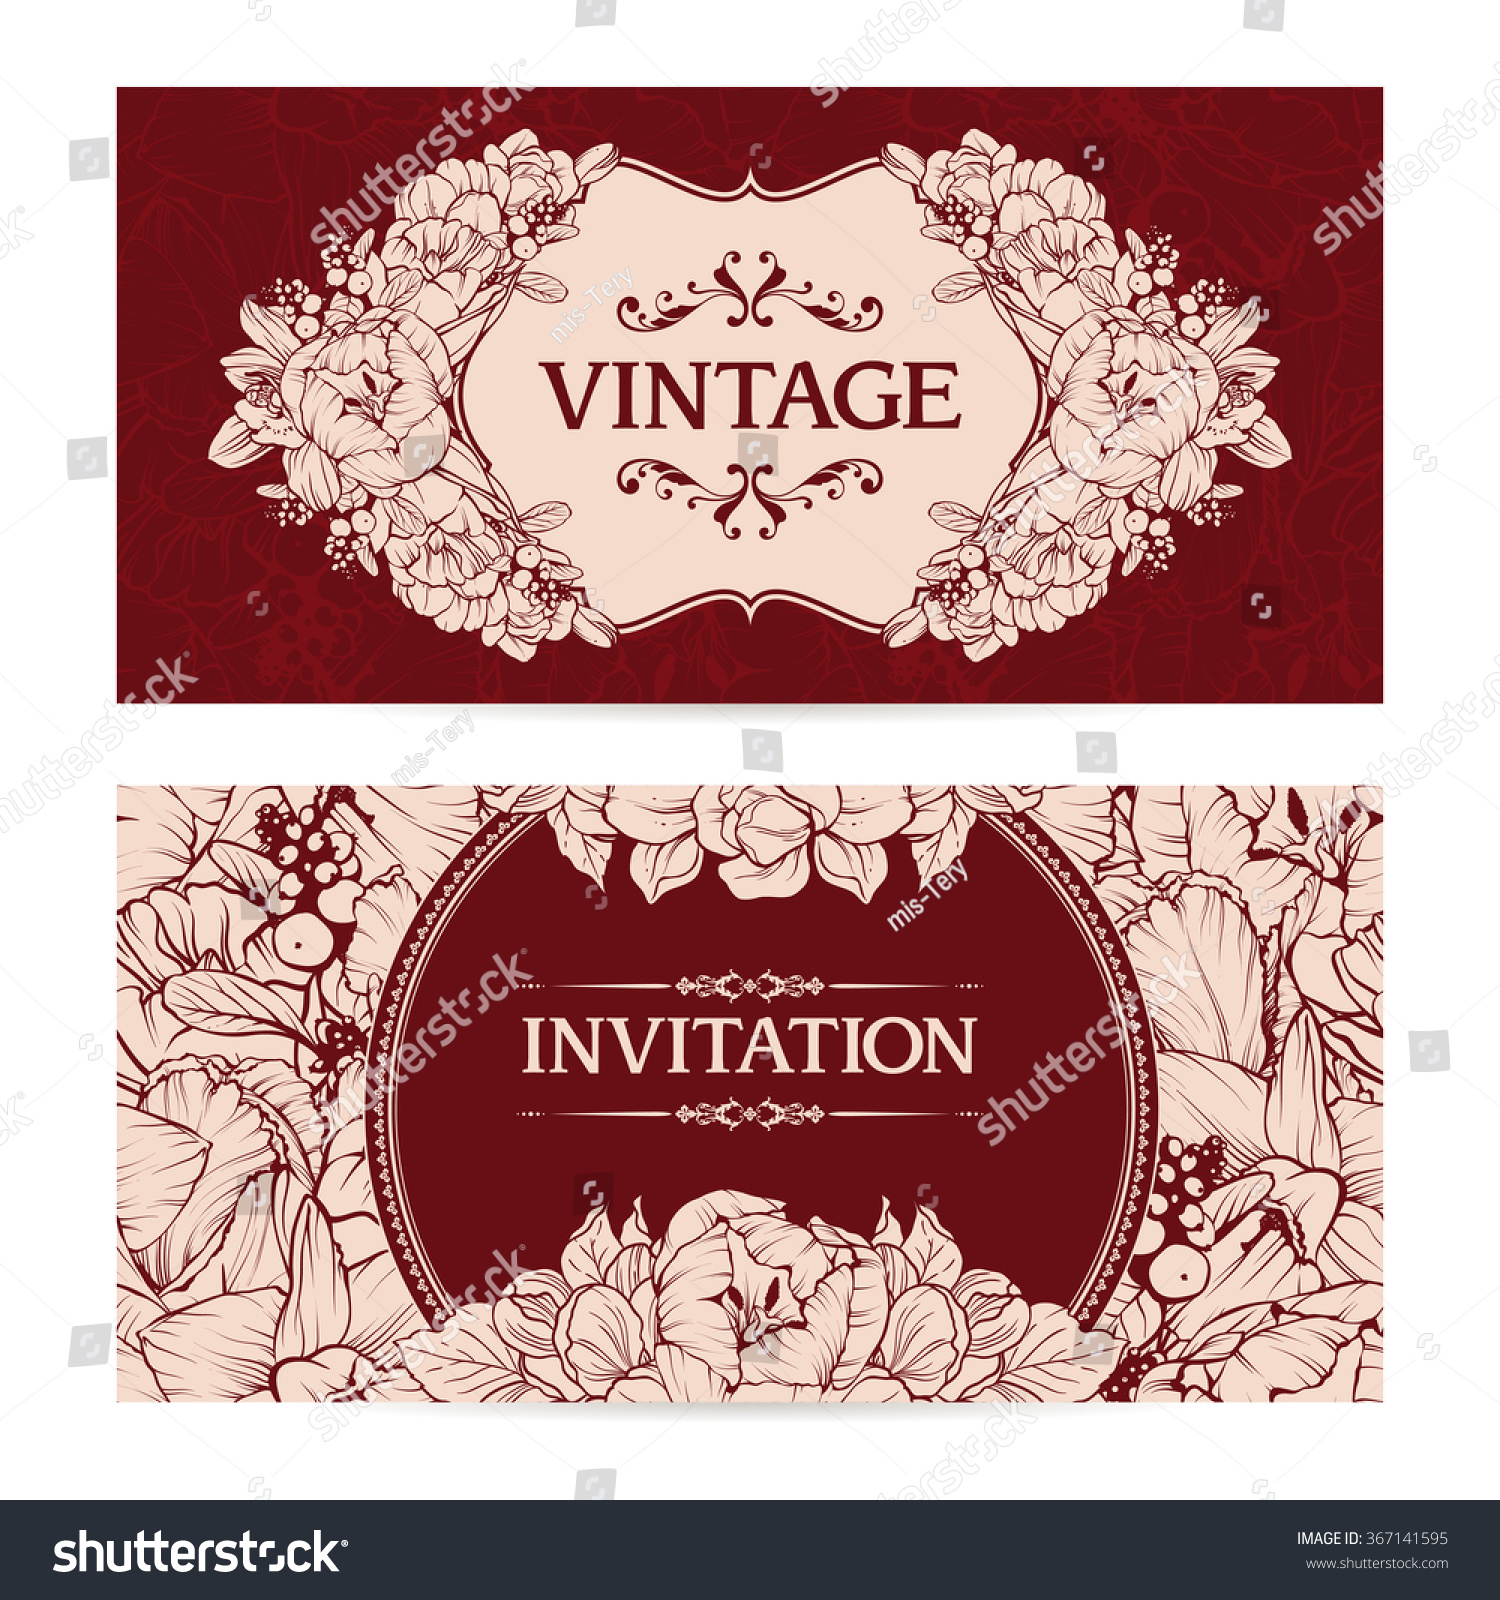 Vector Set Vintage Templates Seamless Floral Stock Photo (Photo ...